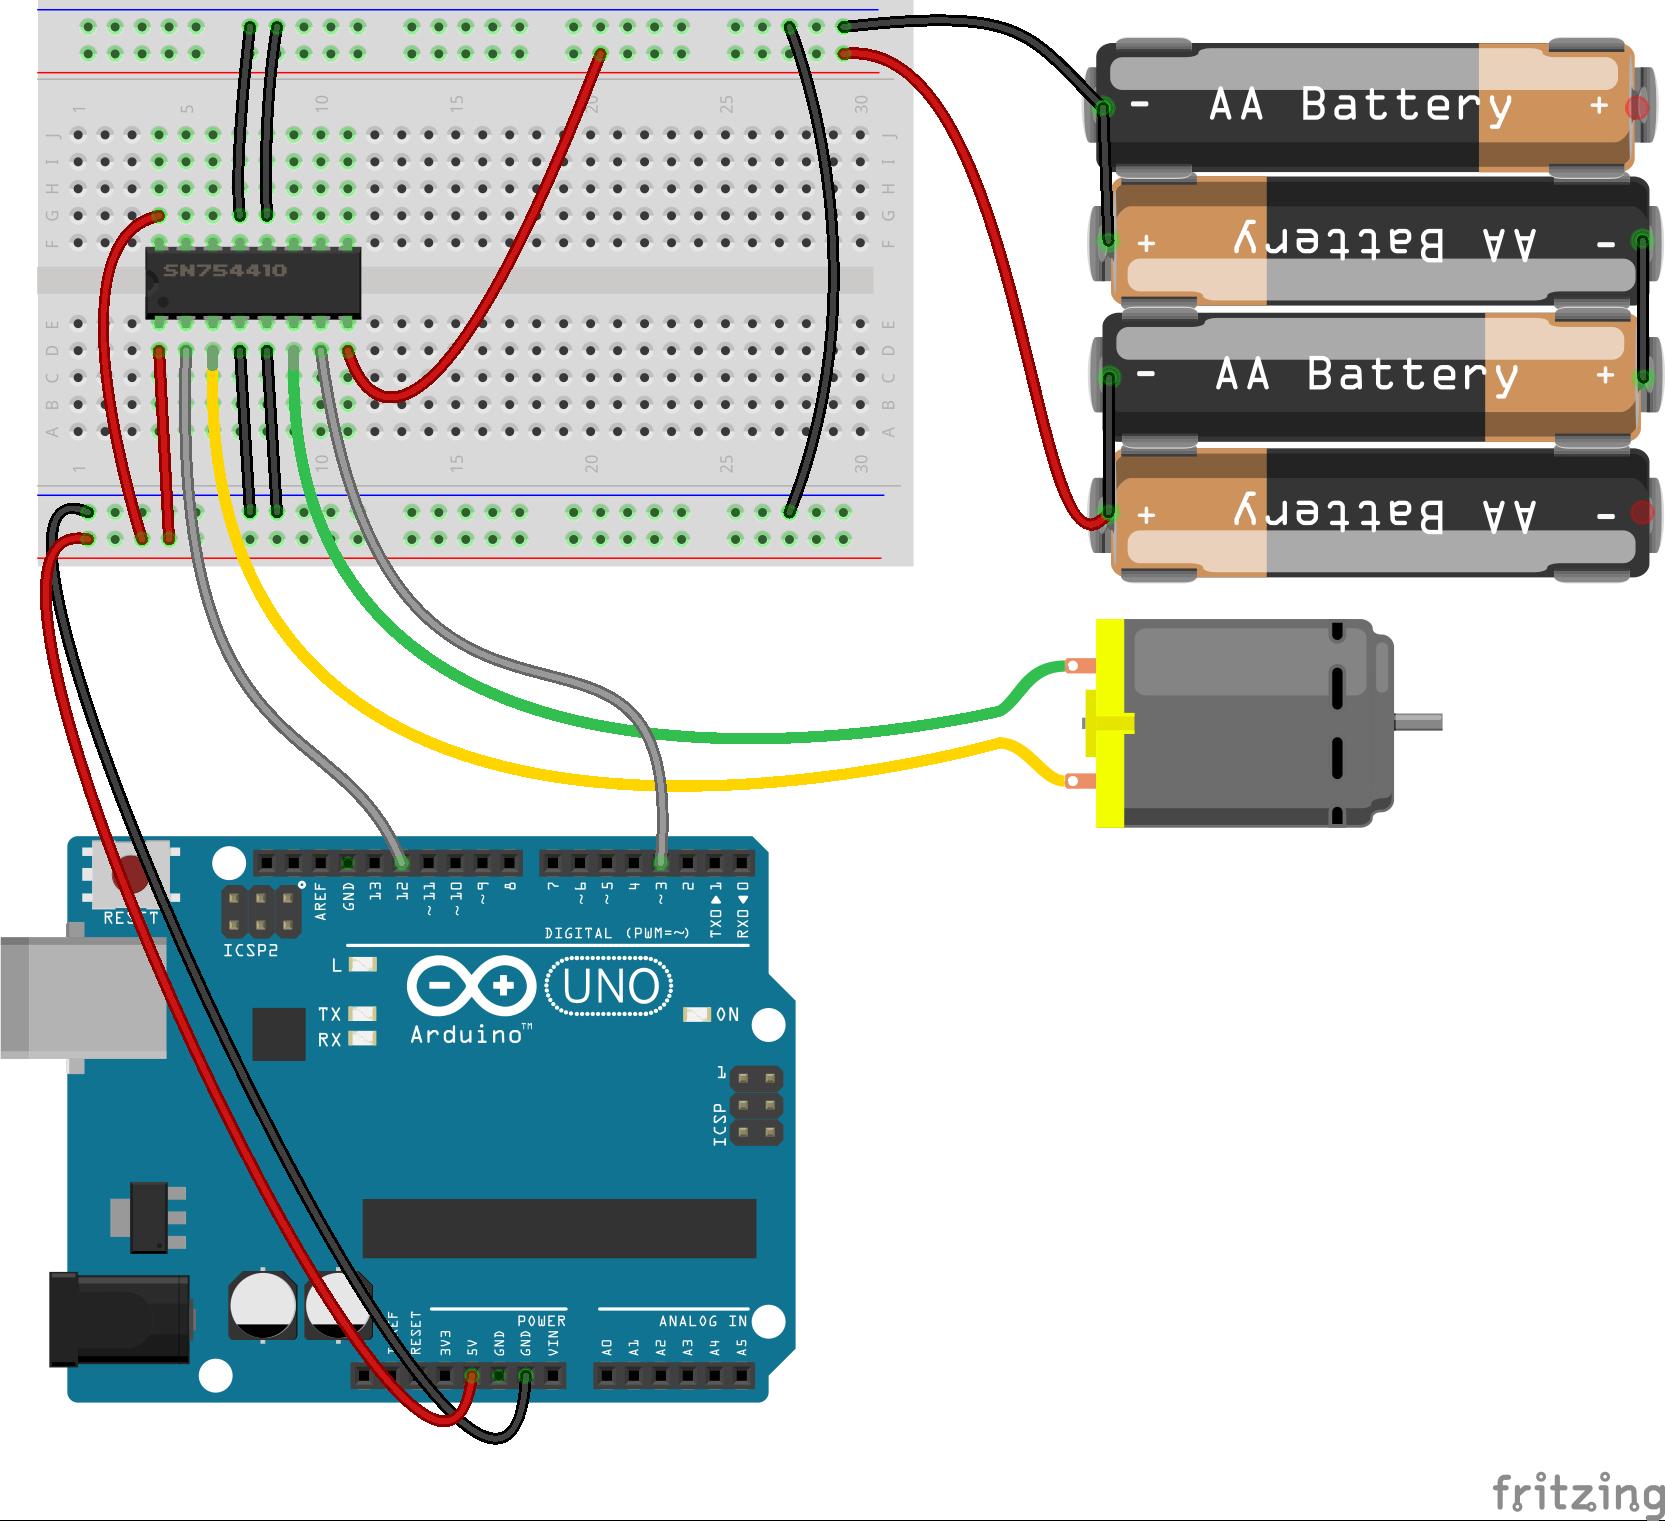 Digital Voltmeter Connection Diagram additionally Wiring Diagram Of Digital additionally Current Meter Schematic as well Analog Voltmeter Wiring Diagram besides 2013 11 16 archive. on digital ammeter circuit diagram 11